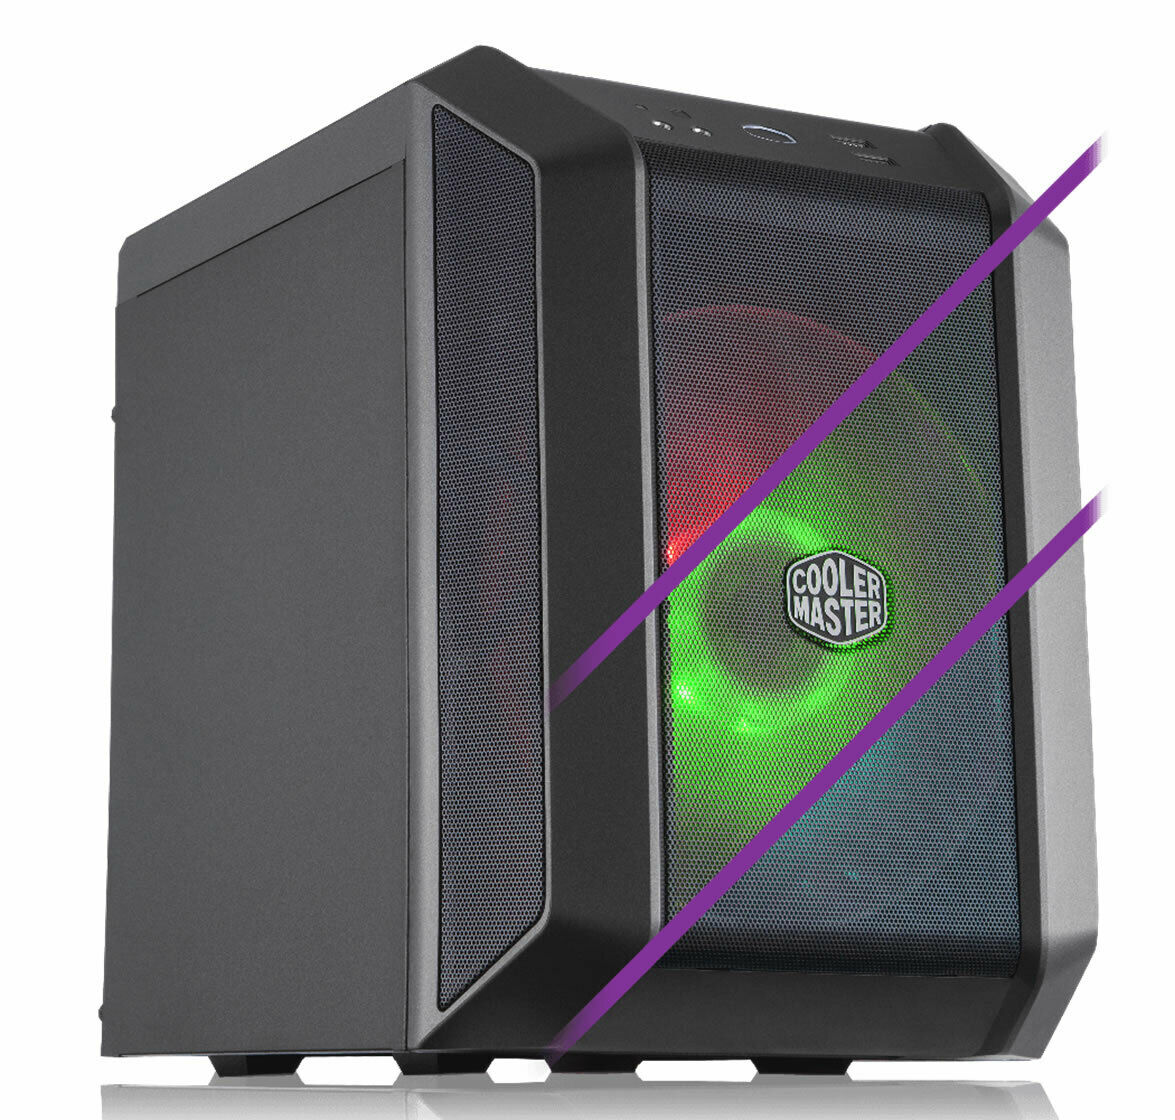 64GB RAM - 12 Core - M.2 SSD - WLAN - Octane Battle Box Mini PC Computer Gaming